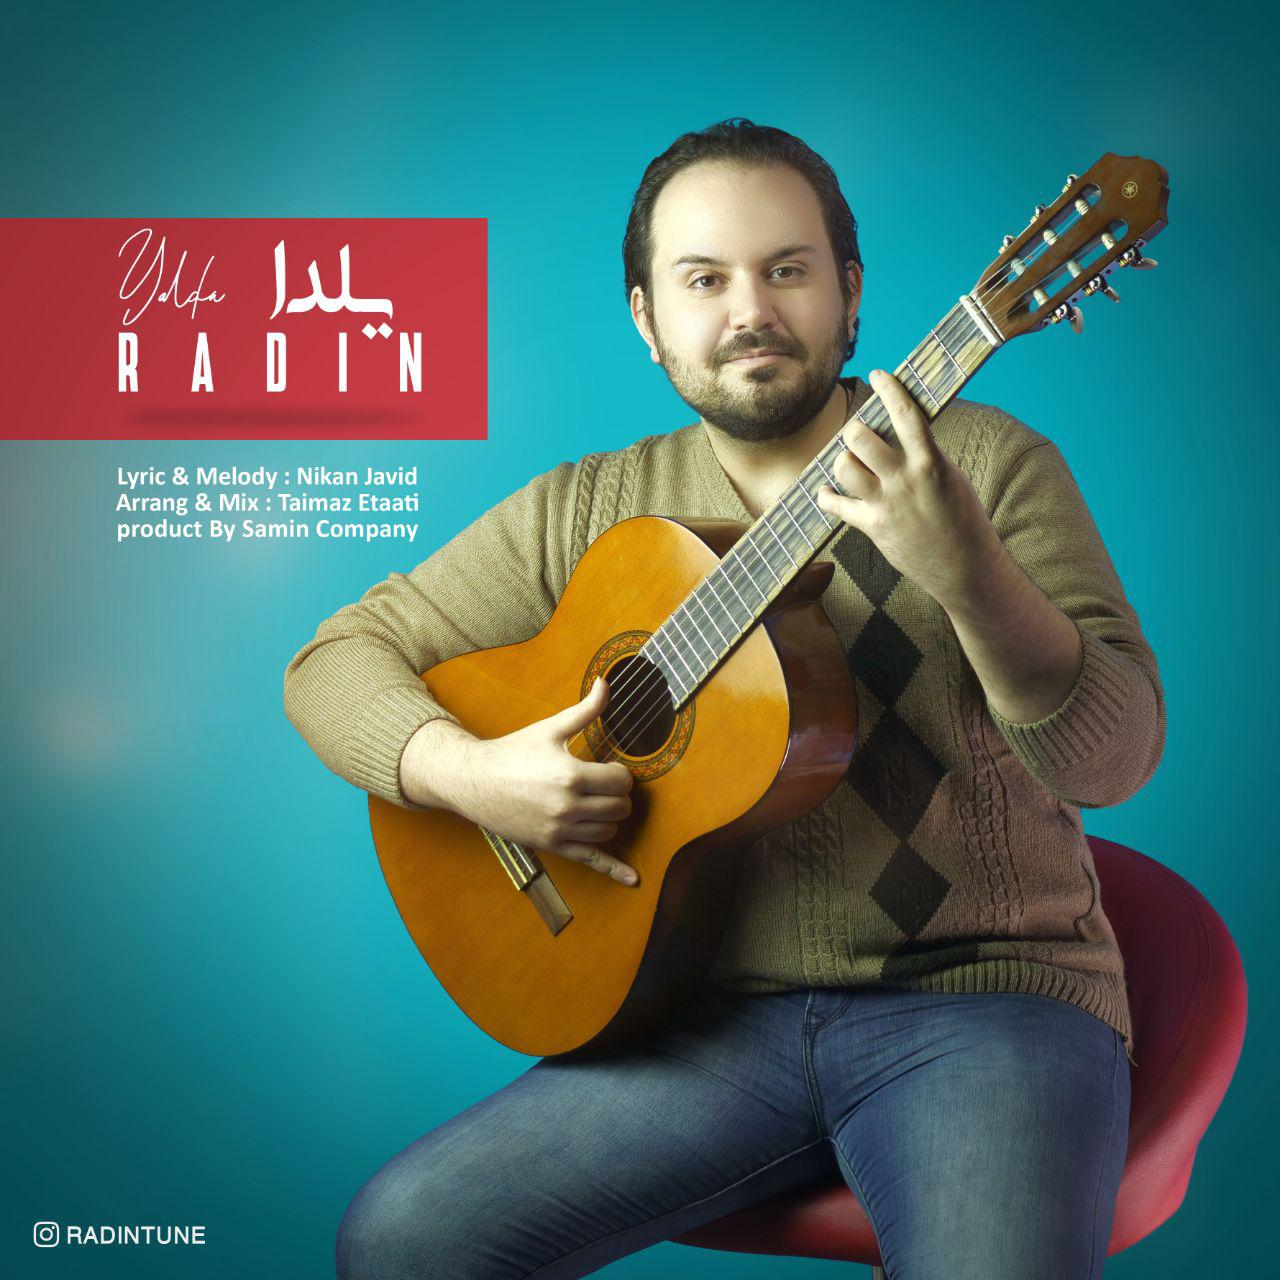 Radin – Yalda